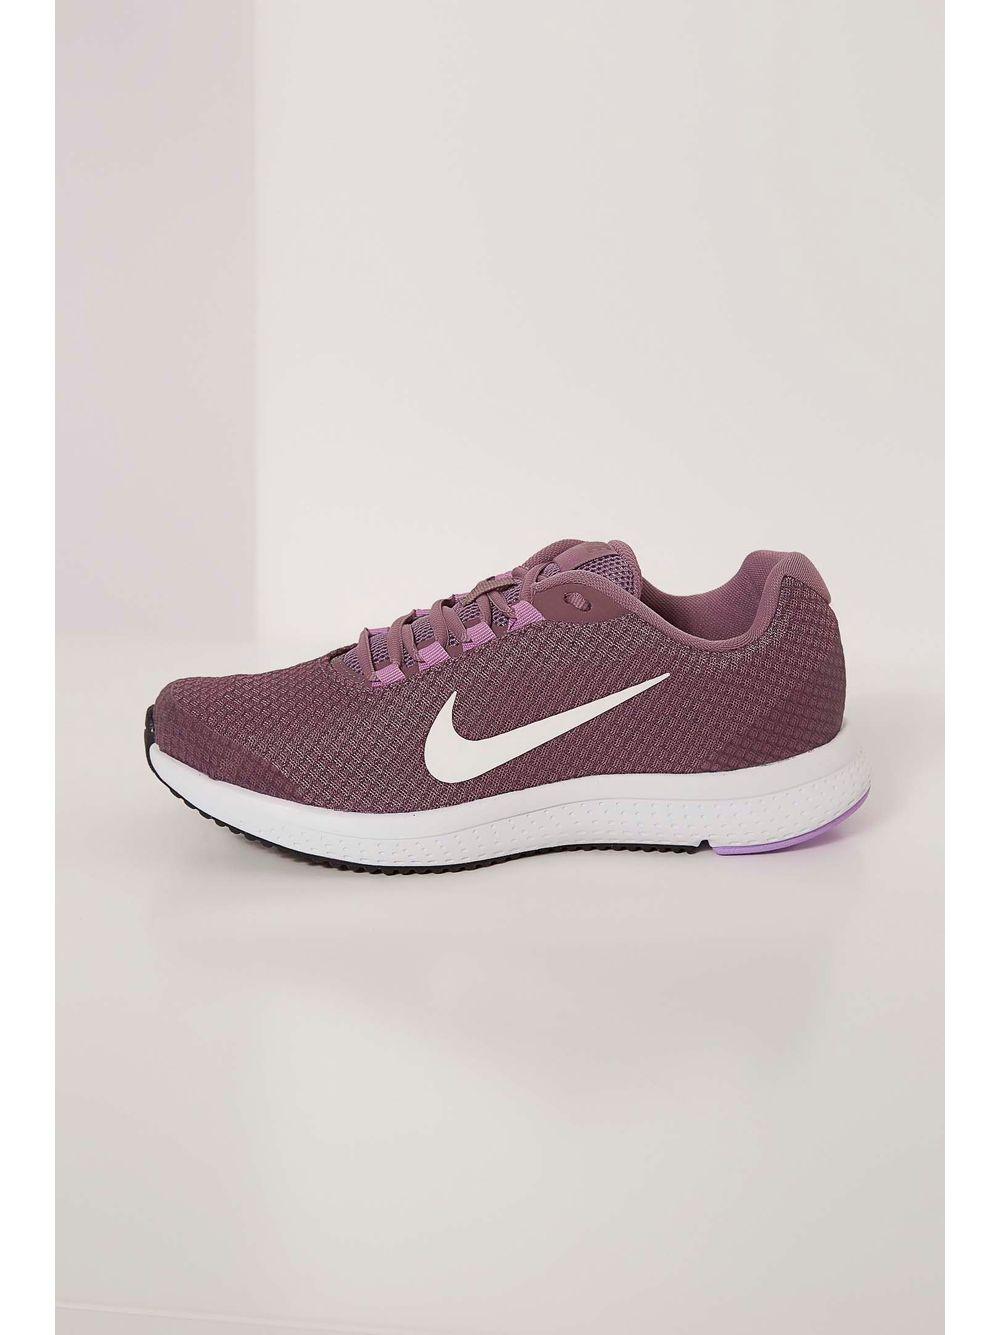 Tênis Nike Runallday Textorizado Feminino - pittol 56bb50de942f7